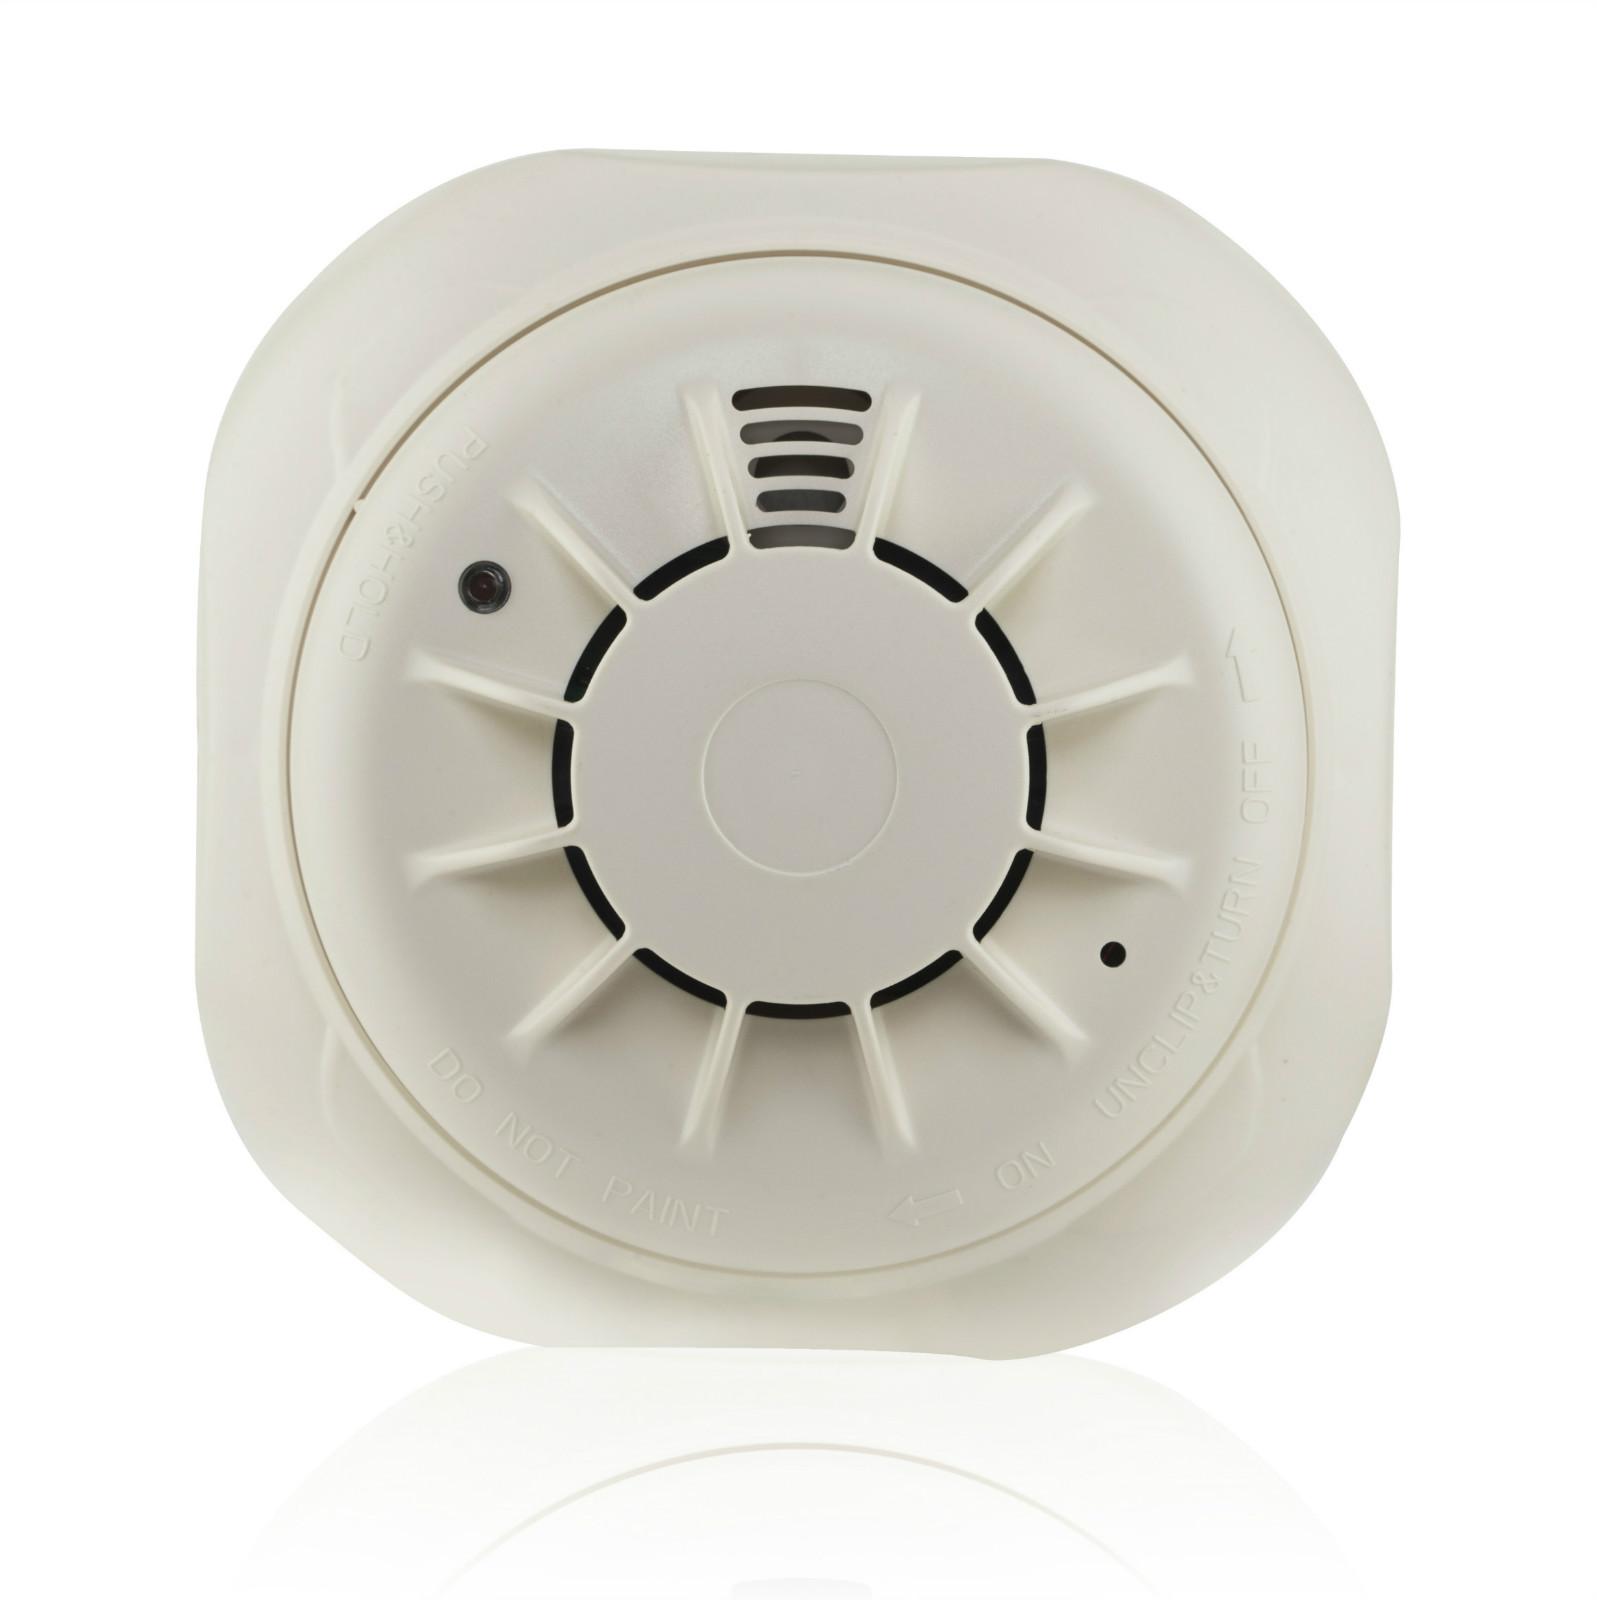 Hd7aae1f286074e17a6f26de847afc29bZ - NB-IOT Verified Internet of Things Device Water Tank Level Sensor